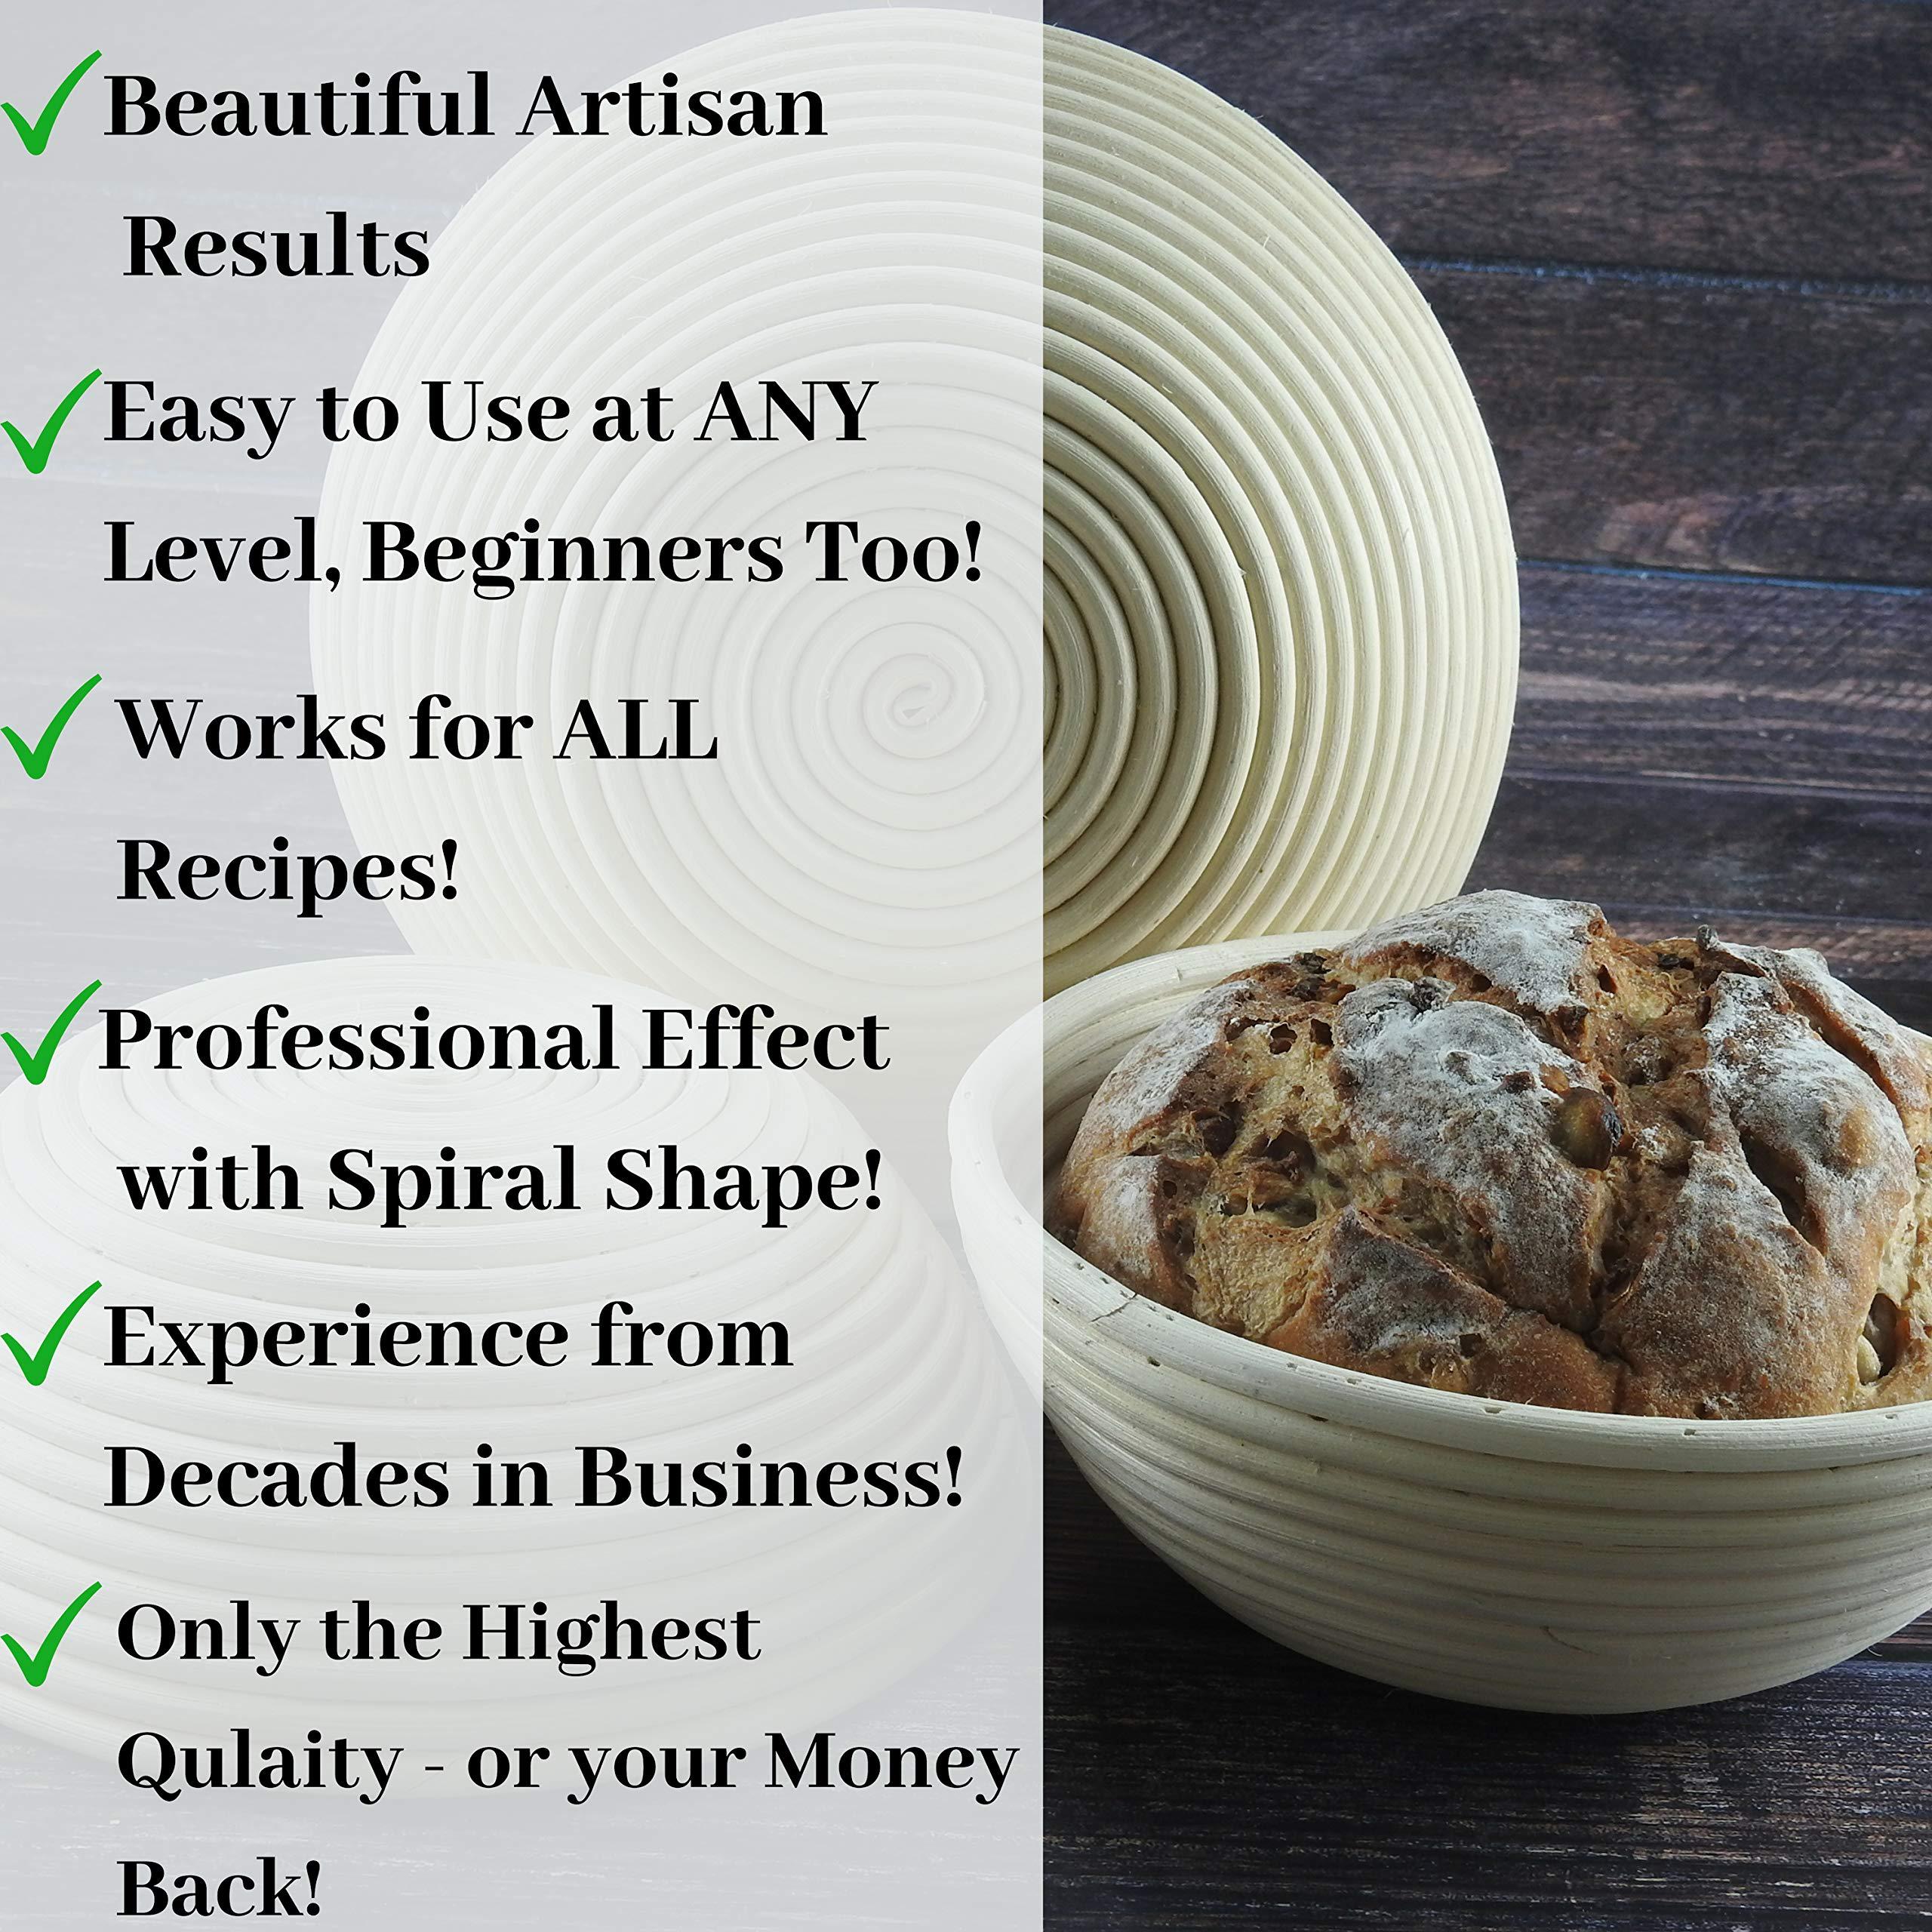 KIT 10 Inch Bread Basket Sourdough Starter - Banneton Proofing Basket, Dough Scraper, Bread Lame, Liner & FREE EBOOK - Bread Proofing Basket for Bread Baking Supplies, Bread Making Tools by PremiumBake (Image #4)